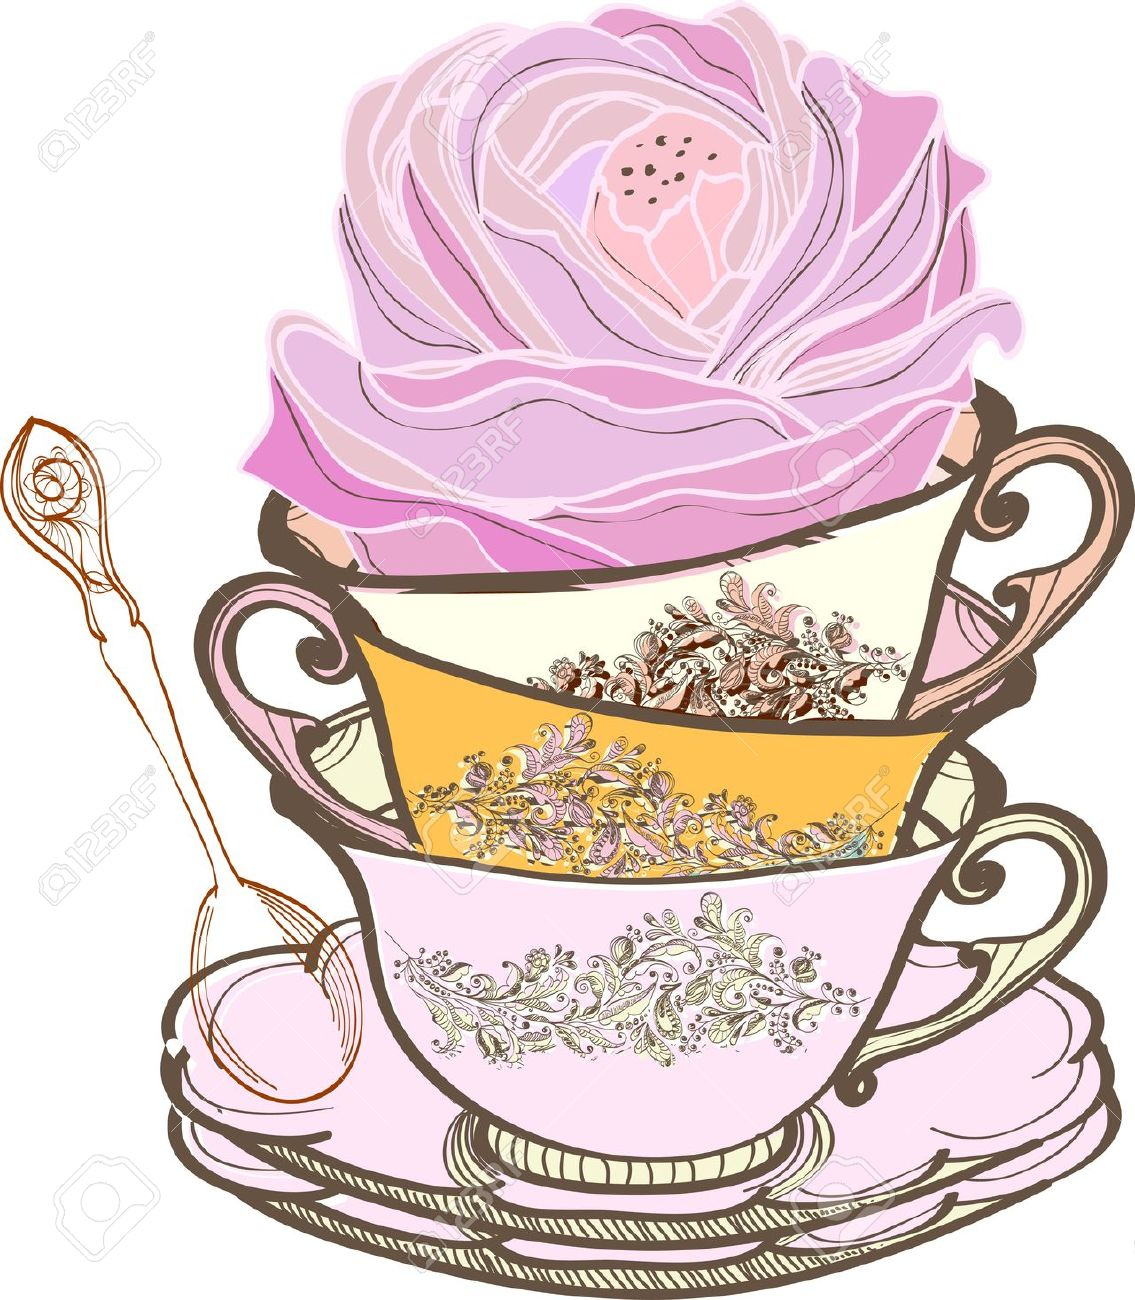 Tea Party , Tea Cup Background .-tea party , tea cup background .-18